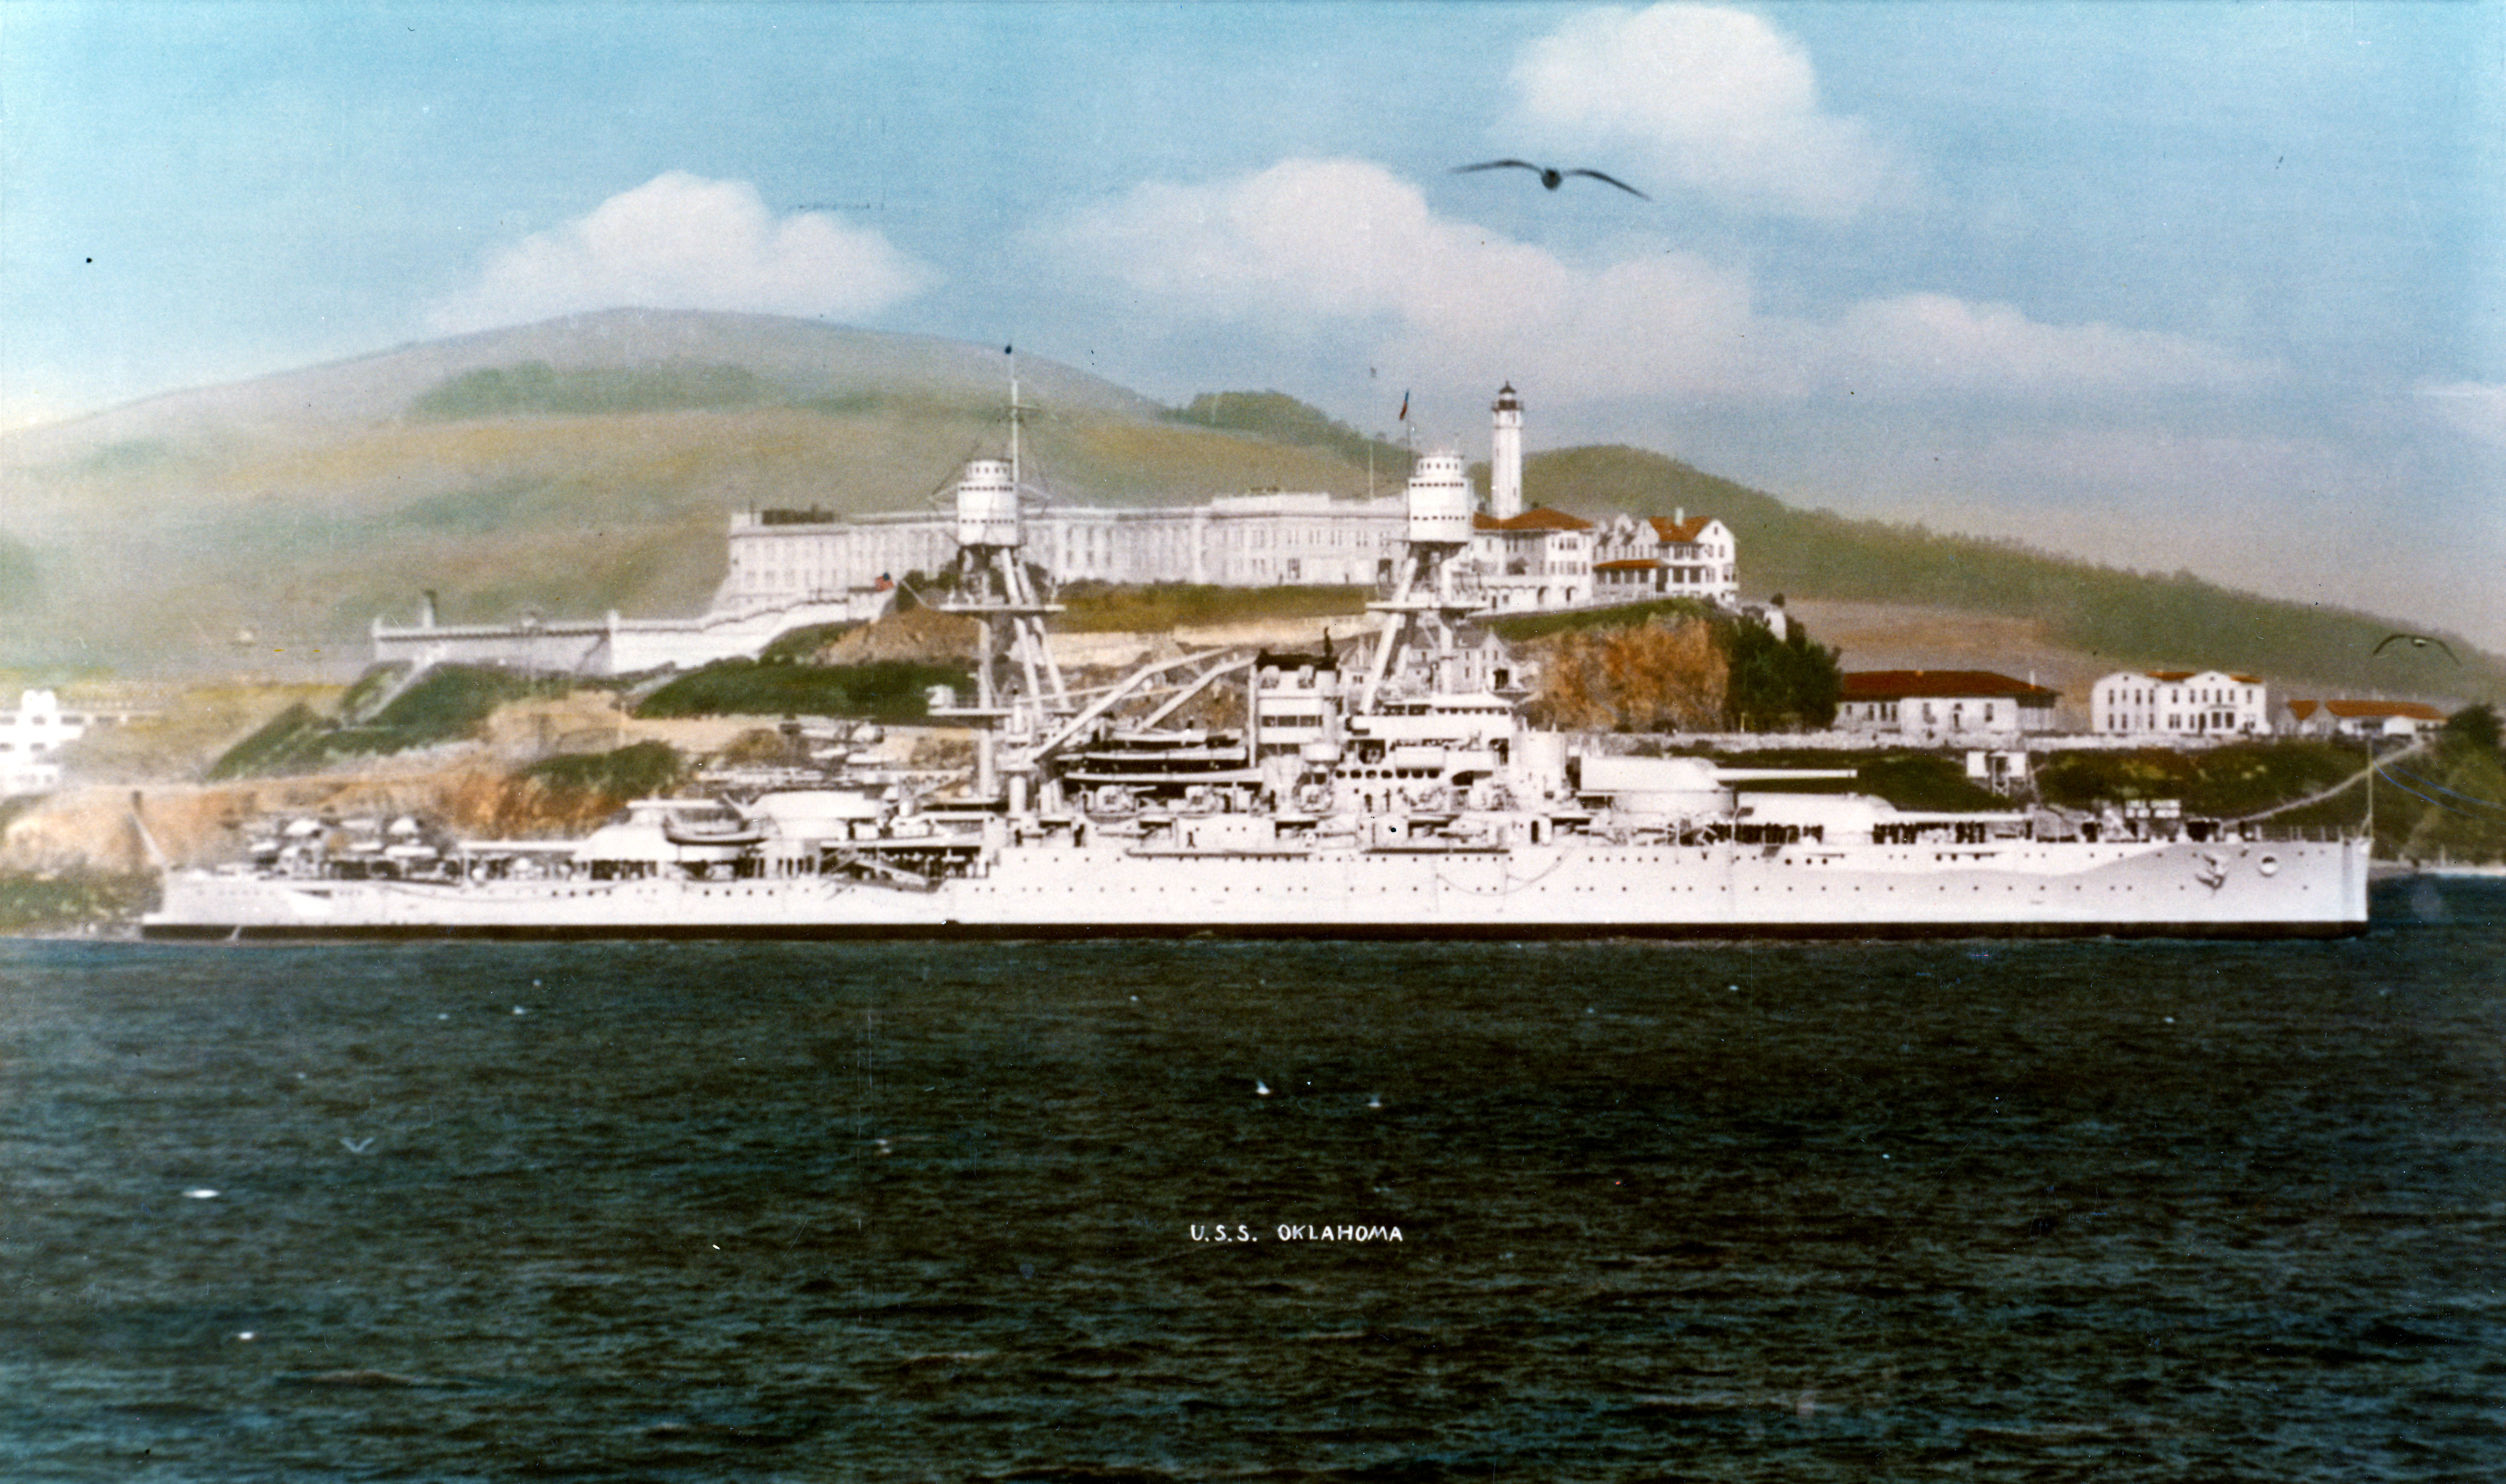 USS Oklahoma (BB-37)  проходит мимо острова Алькатрас. Фото: U.S. Naval History and Heritage Command Photograph.